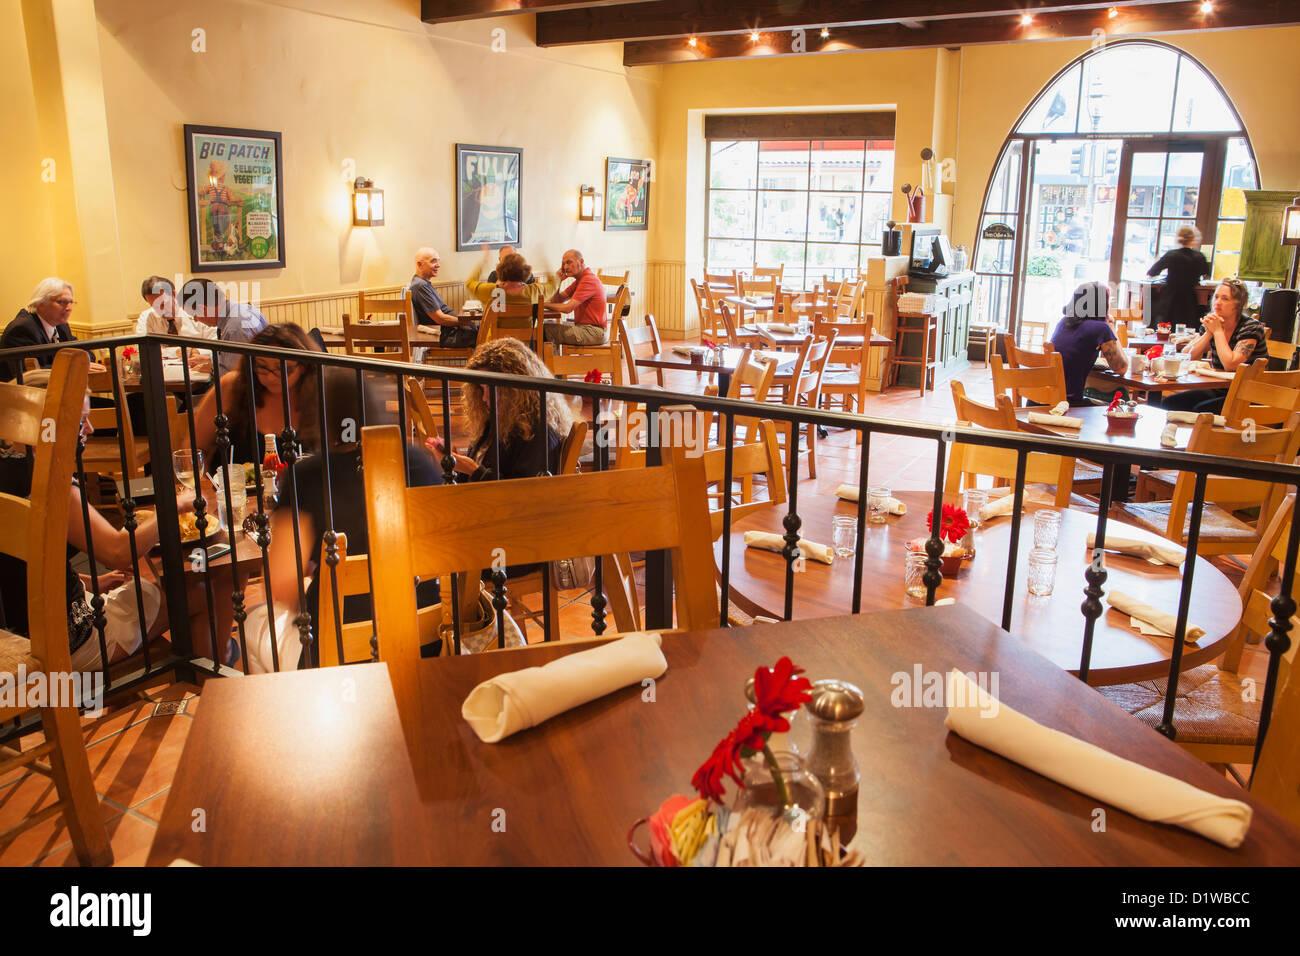 interior of Tupelo Junction Cafe, Santa Barbara, California, United States of America - Stock Image